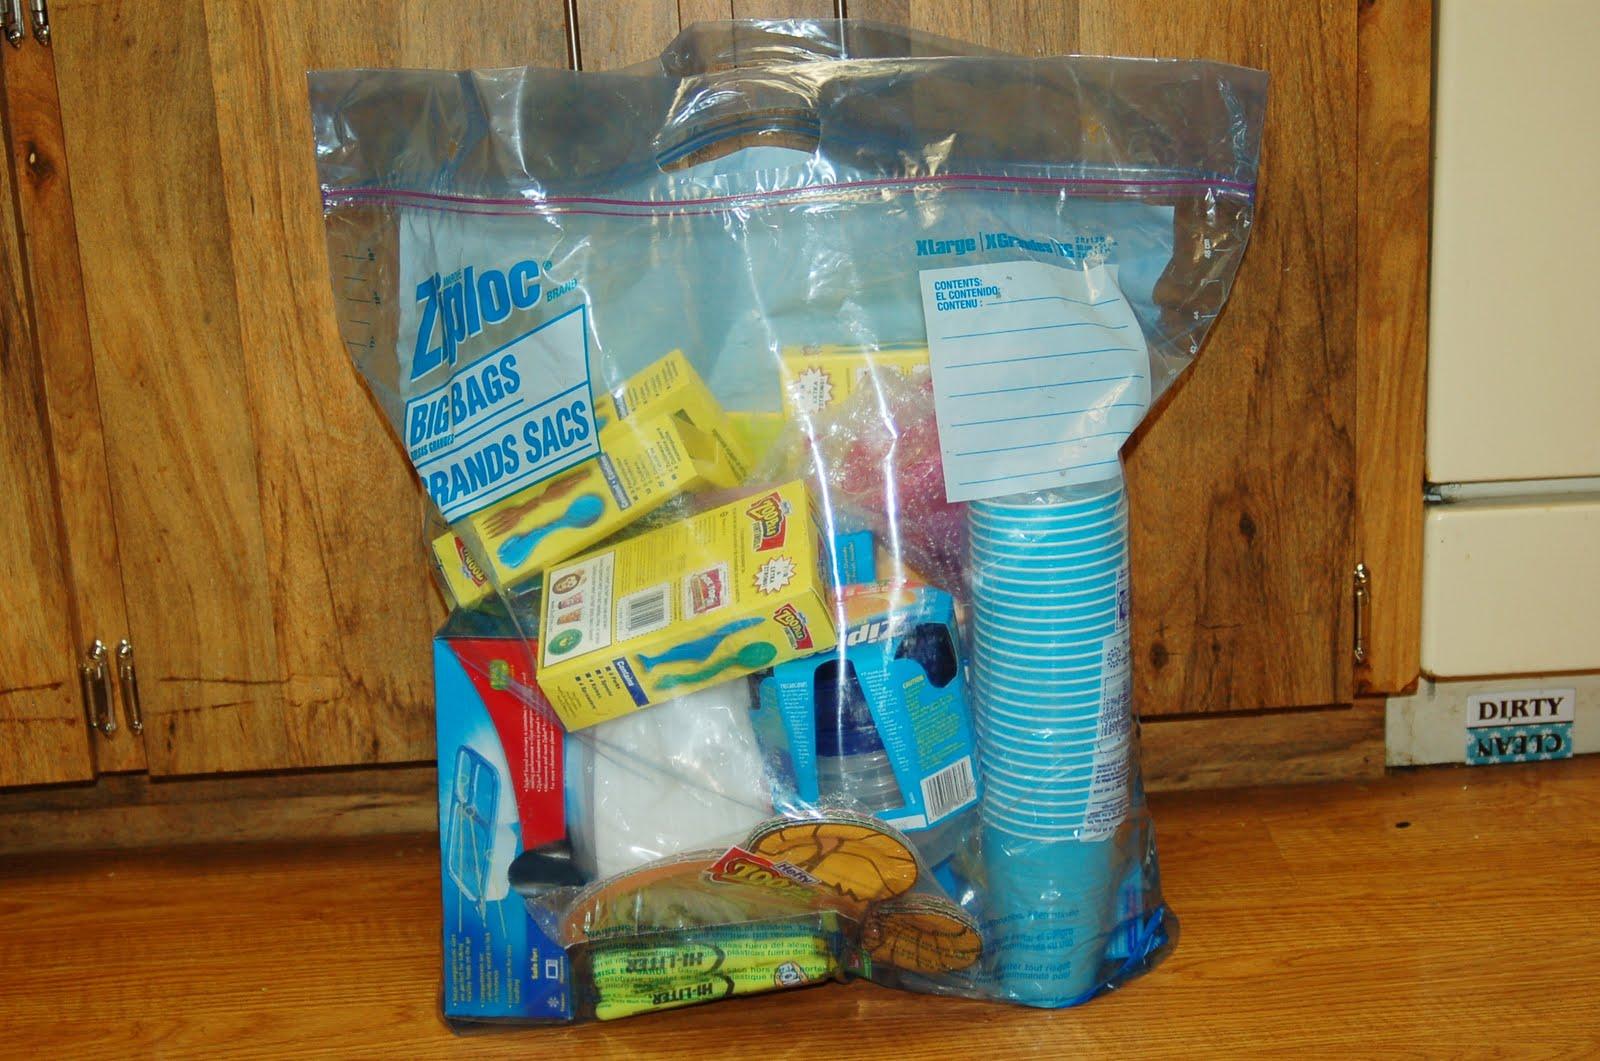 Zip lock Big bags